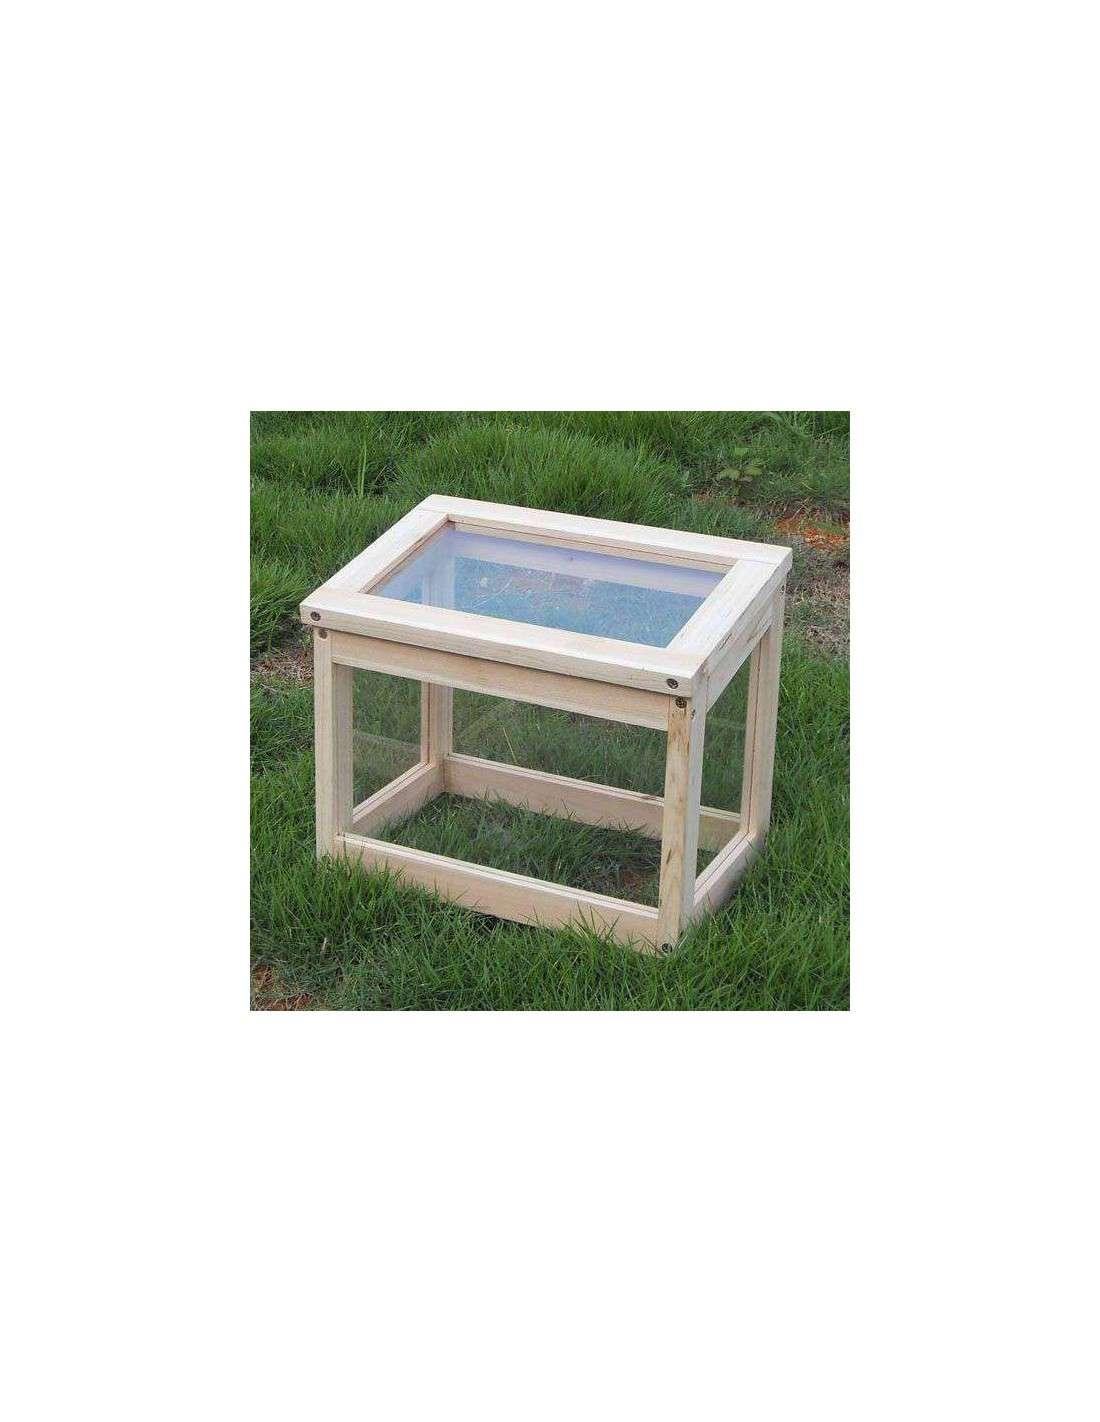 Mini invernadero de madera para huerto y jard n de 30x20x25cm - Mini invernadero casero ...